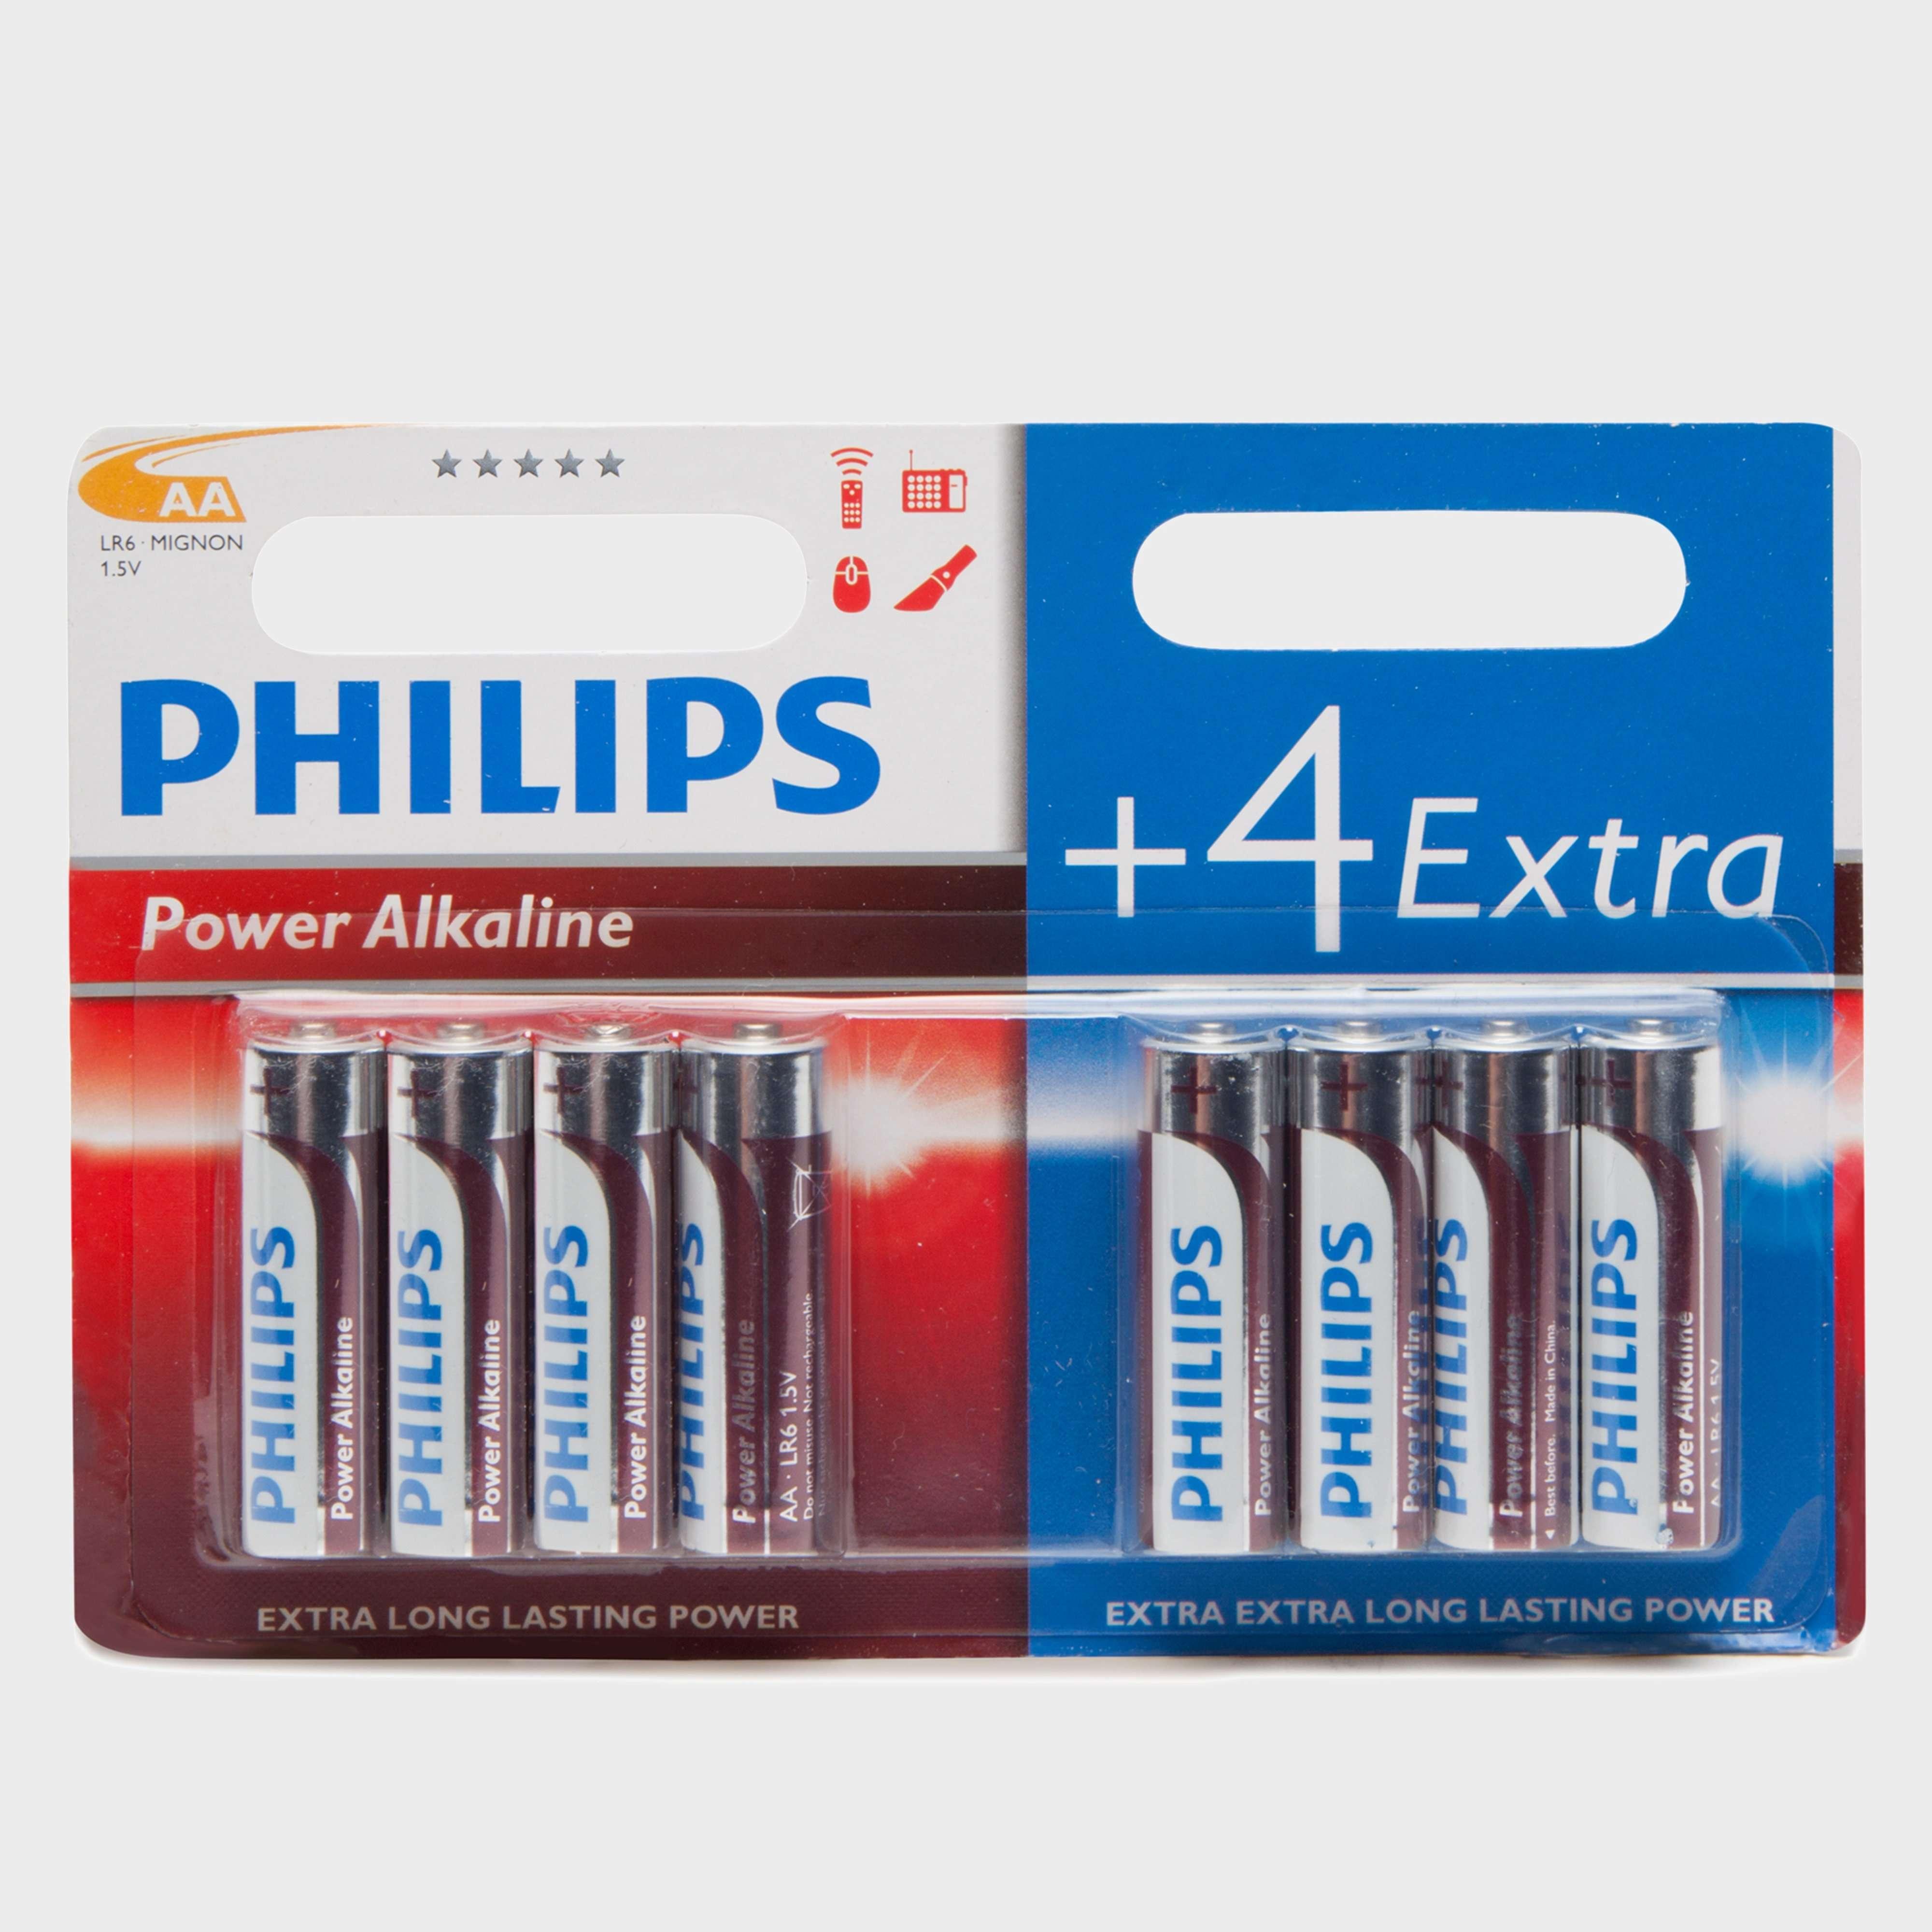 PHILLIPS Ultra Alkaline AA LR6 Batteries 8 Pack